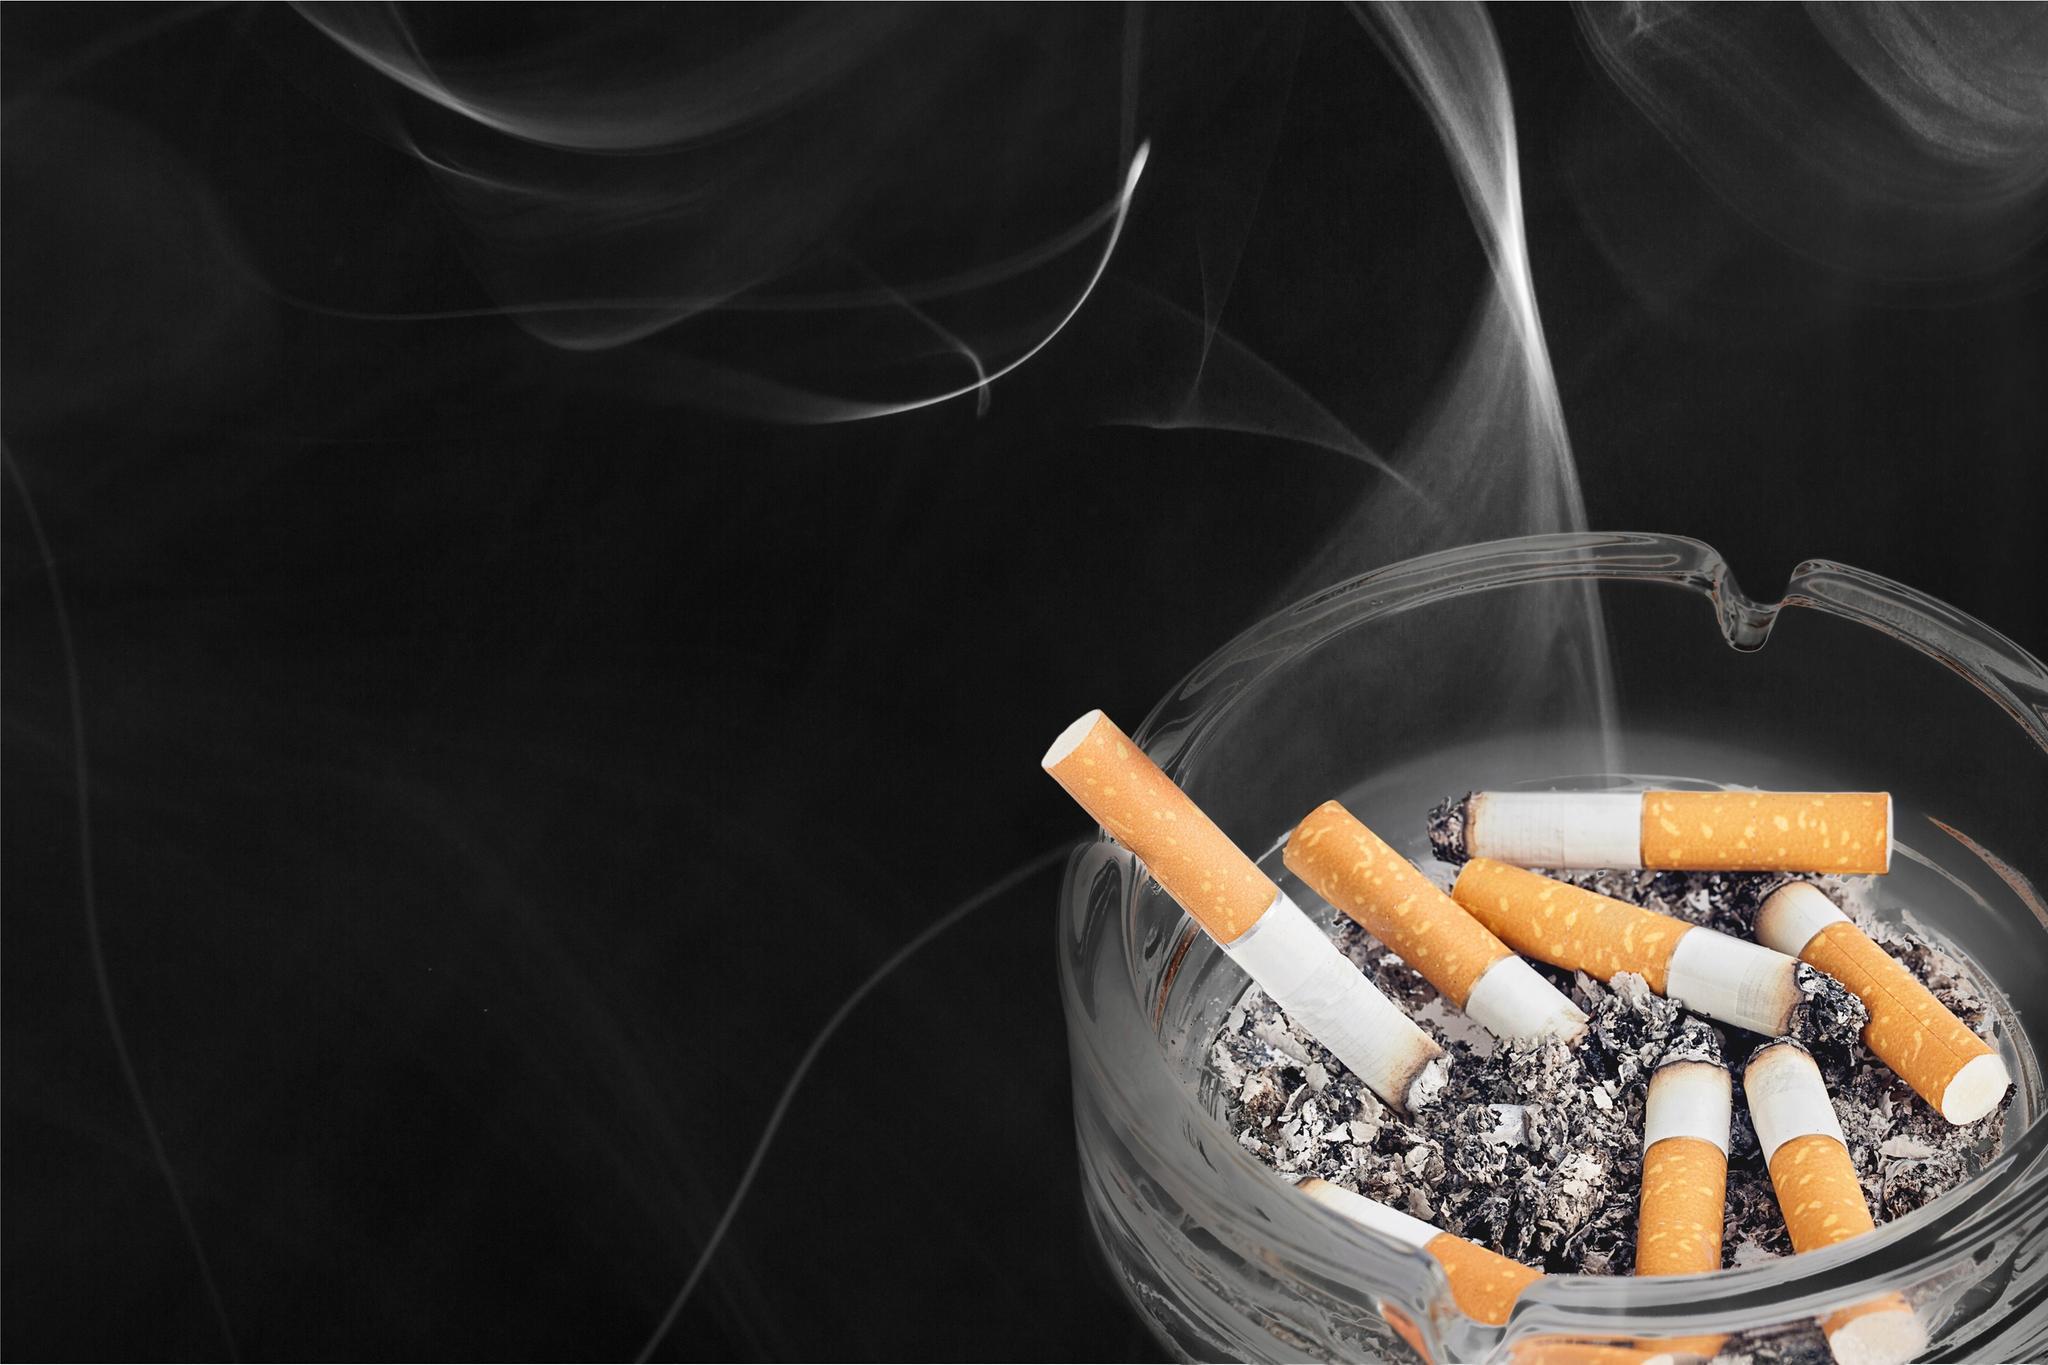 Scholz möchte Zigaretten deutlich teurer machen